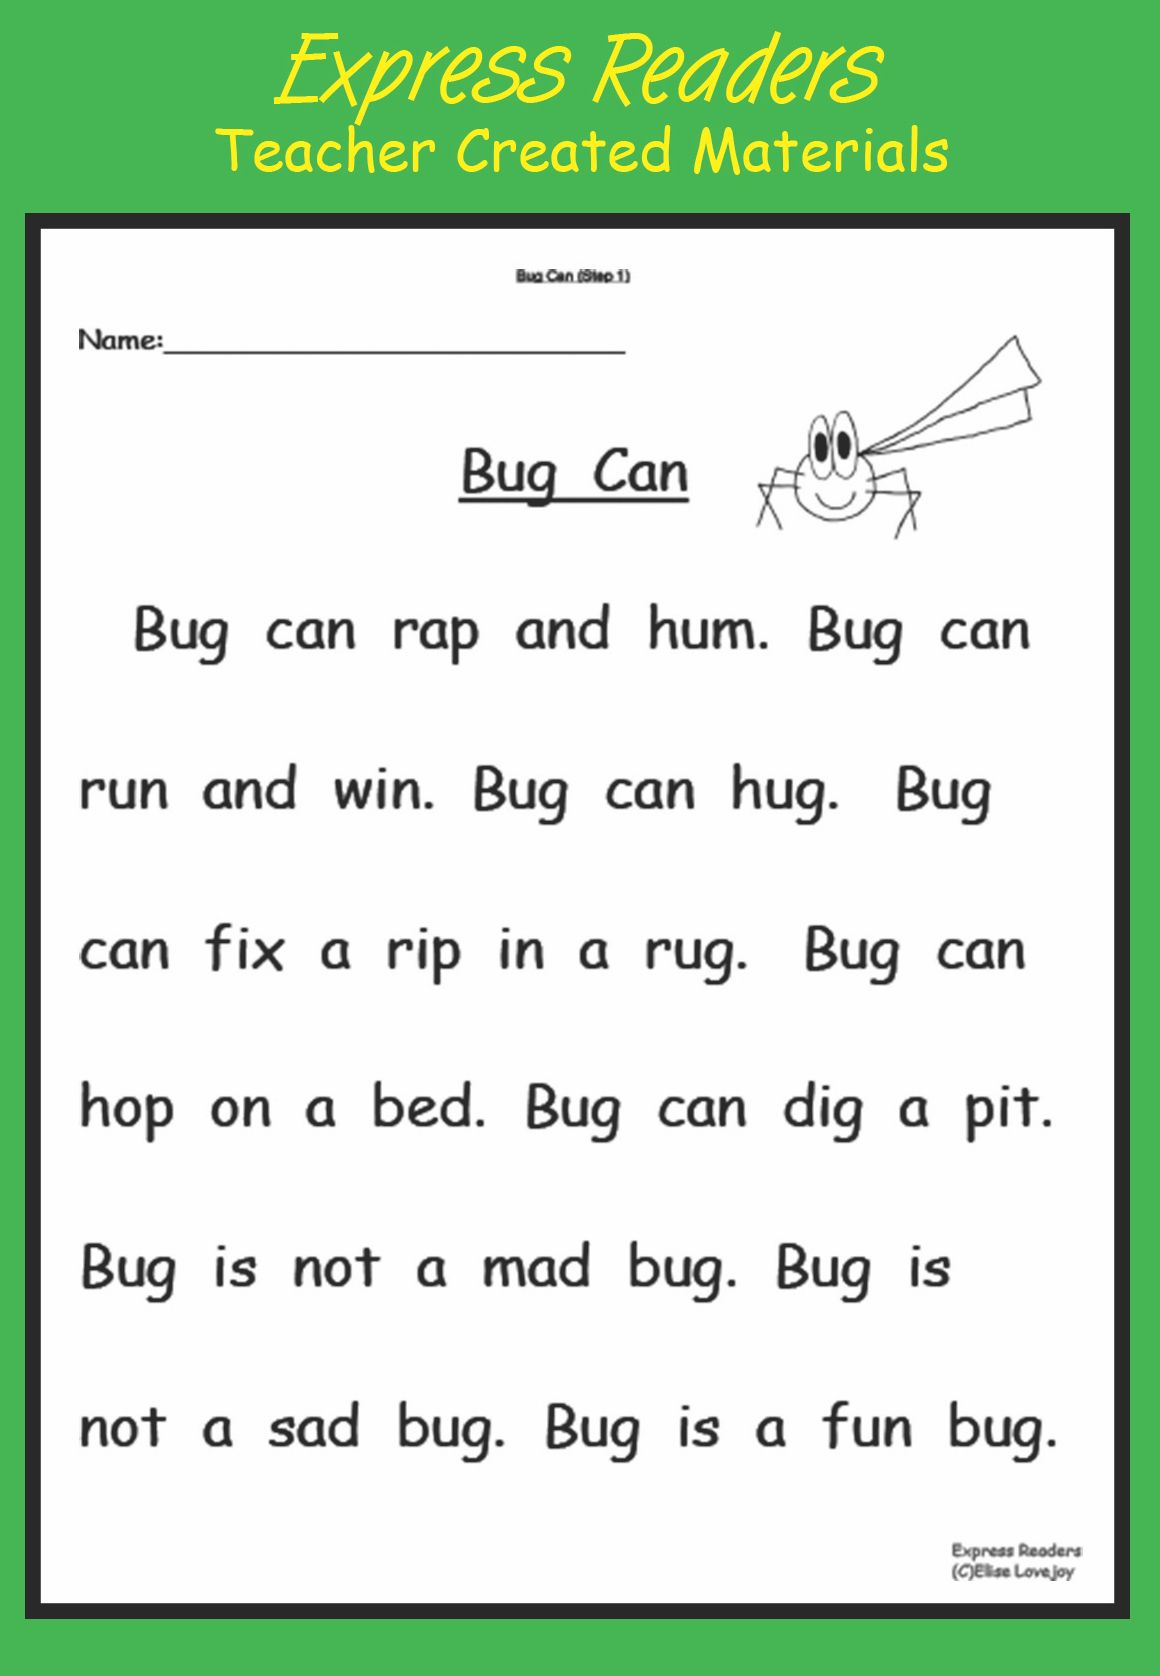 Free Cvc Word Short Story Phonics Reading Passages Reading Cvc Words Reading Comprehension Kindergarten [ 1676 x 1160 Pixel ]